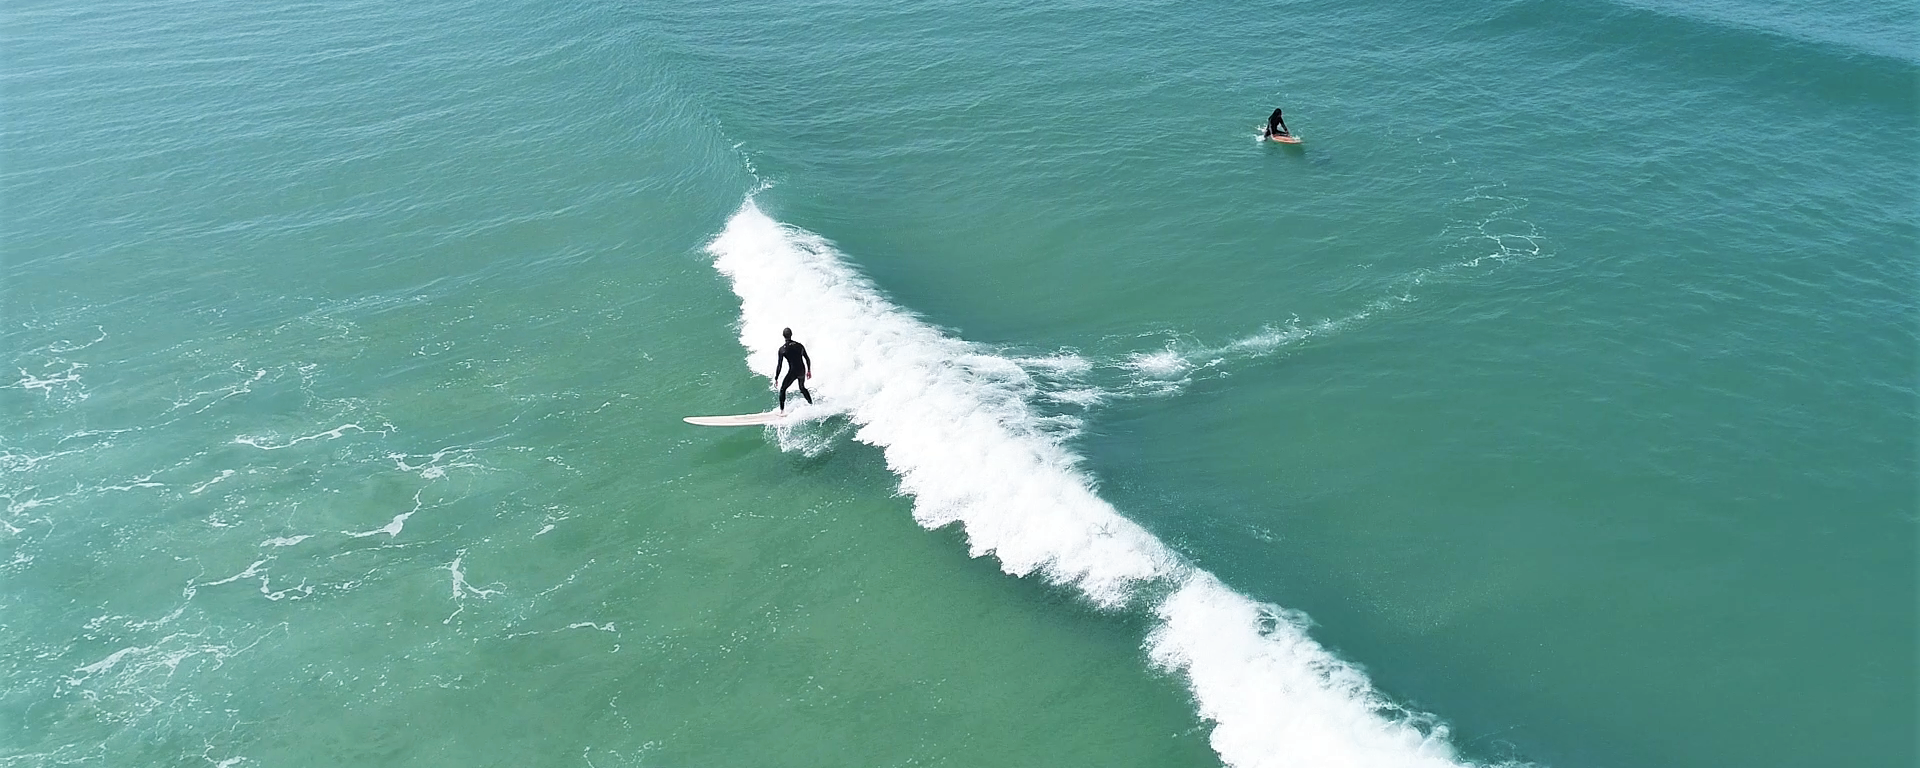 Surfer en Baie d'Audierne ©Gwenn Ha Drone